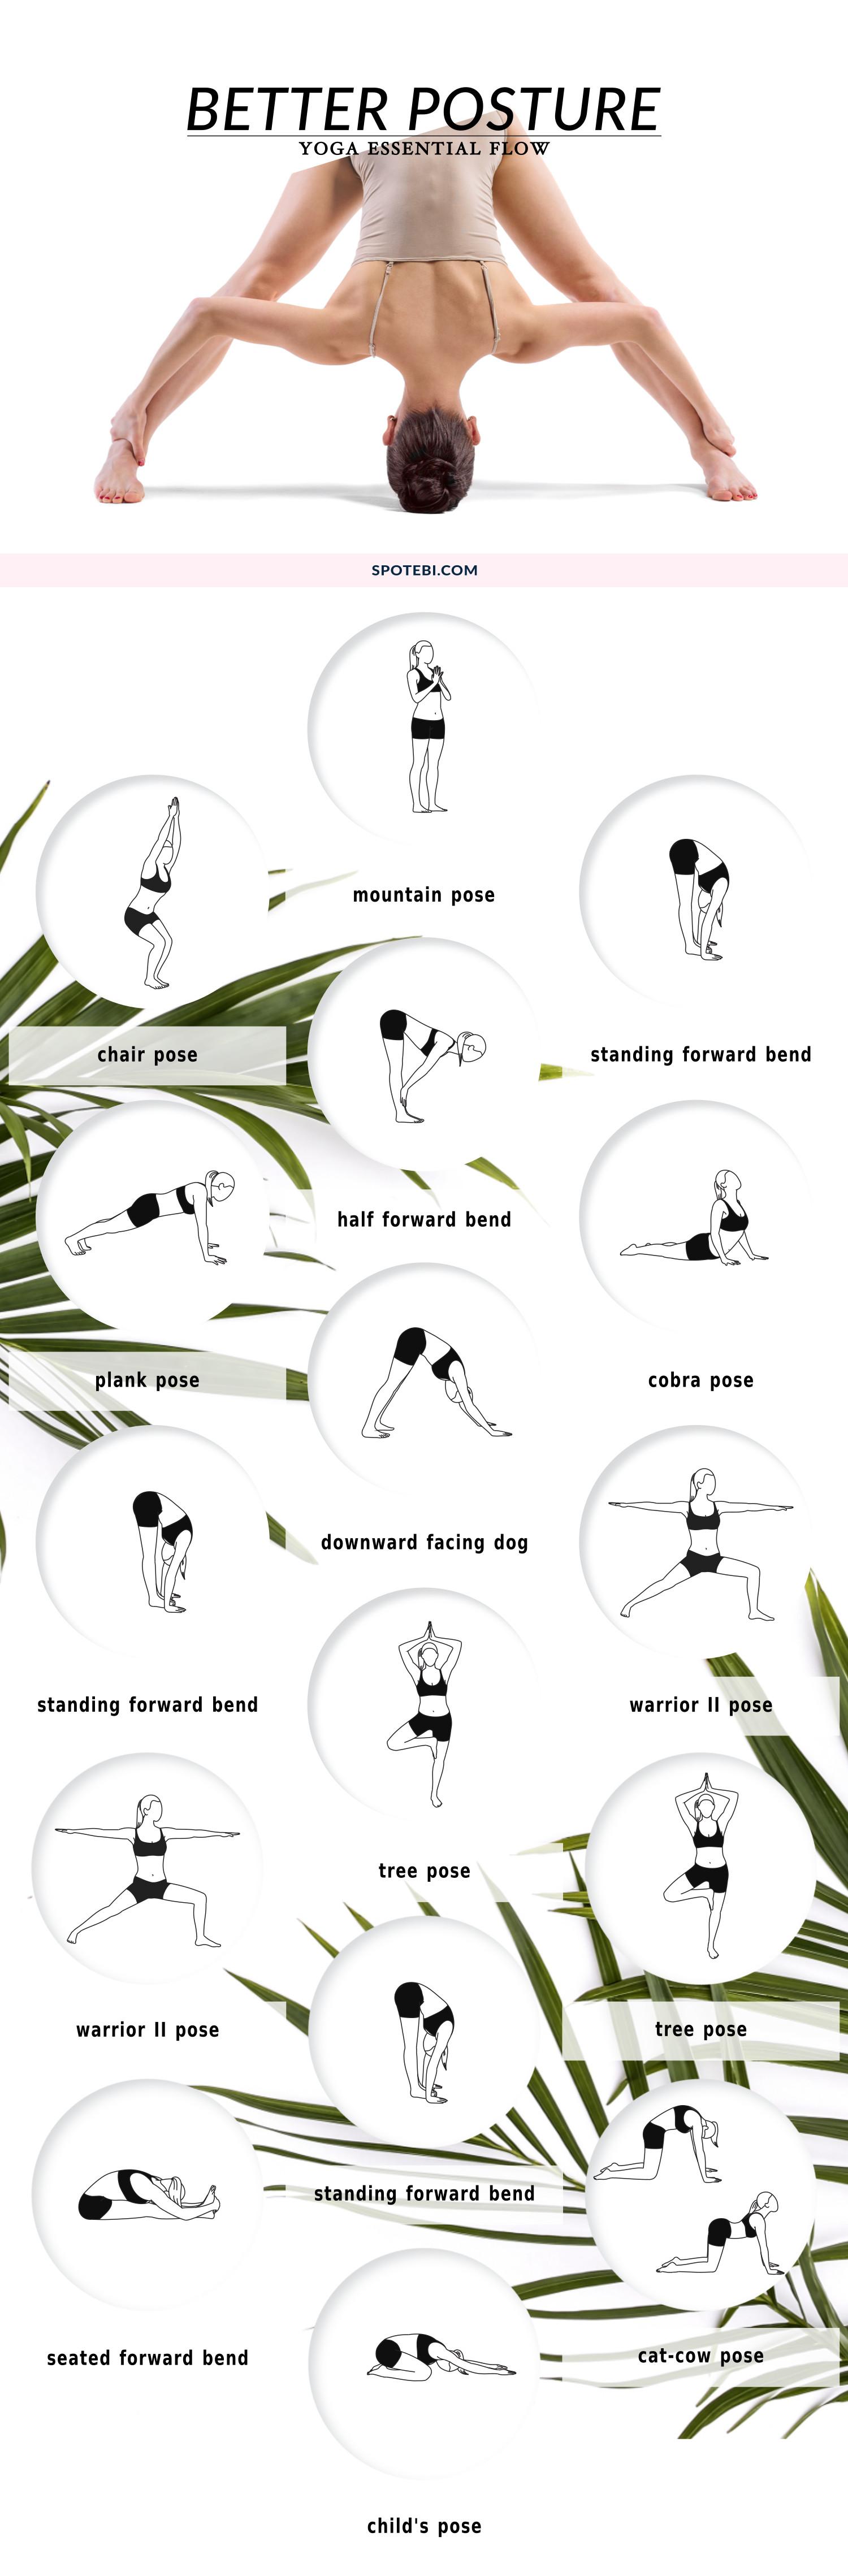 posture alignment chair roman leg raise yoga essential flow better